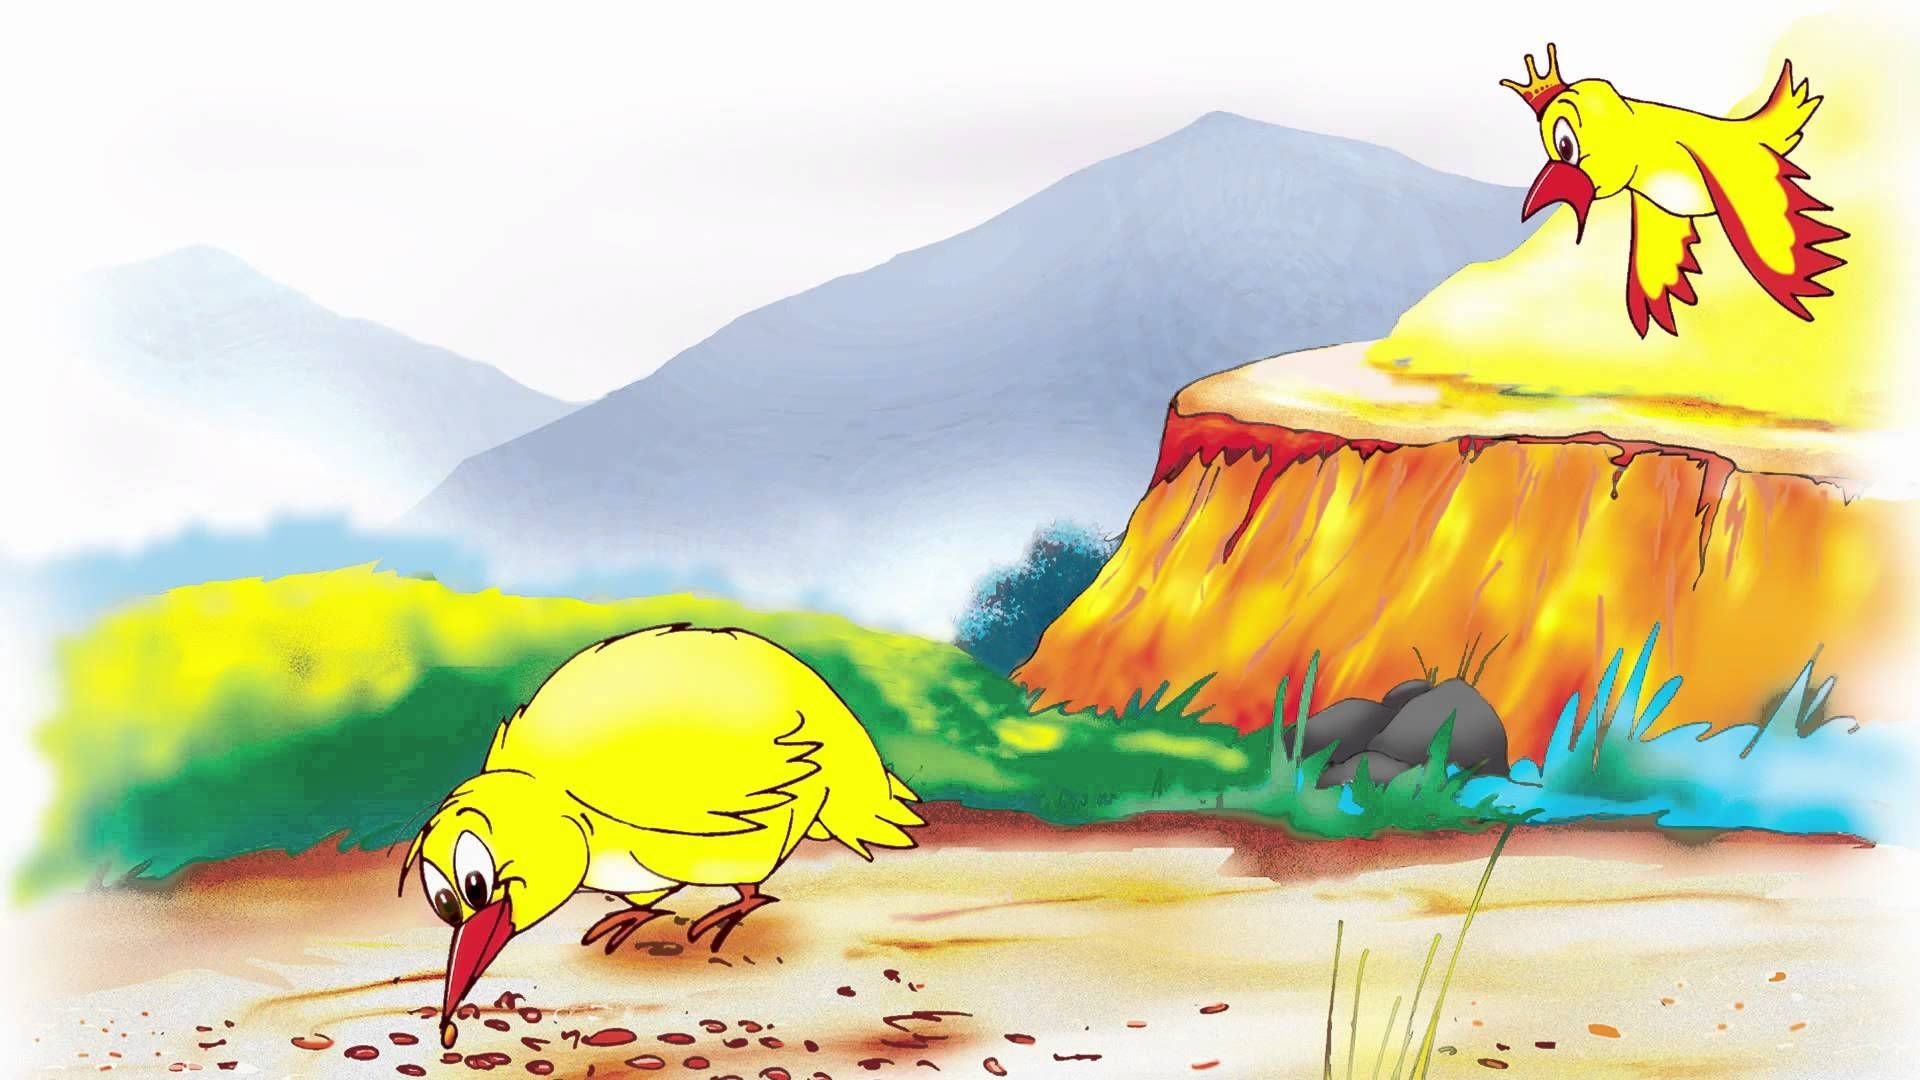 The Jataka Tale of the Deceitful Bird